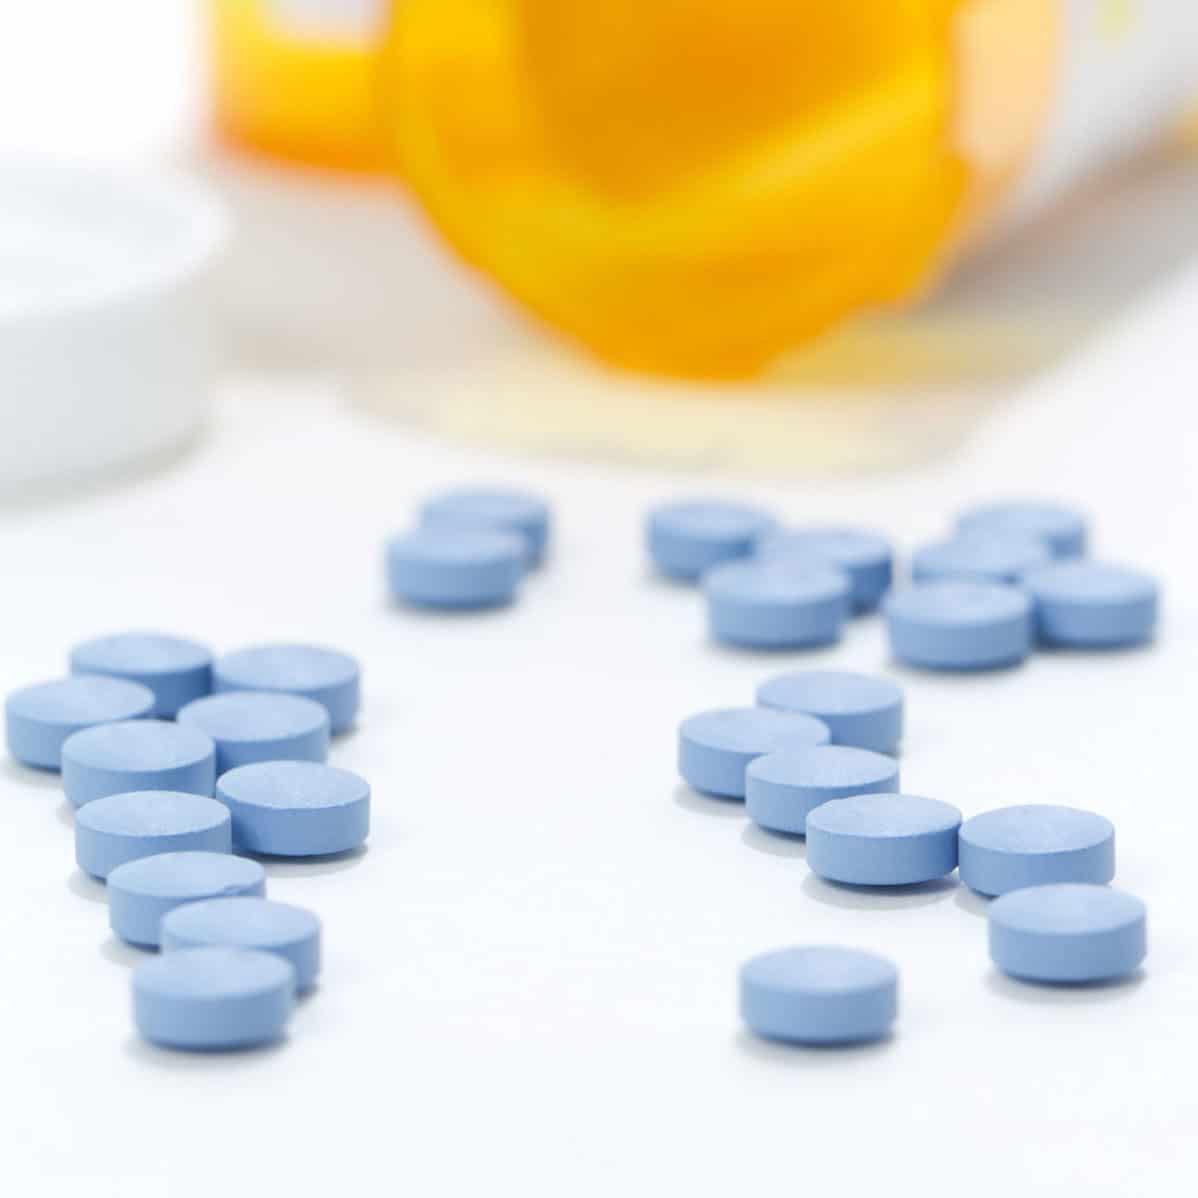 Failure Monitor Medication